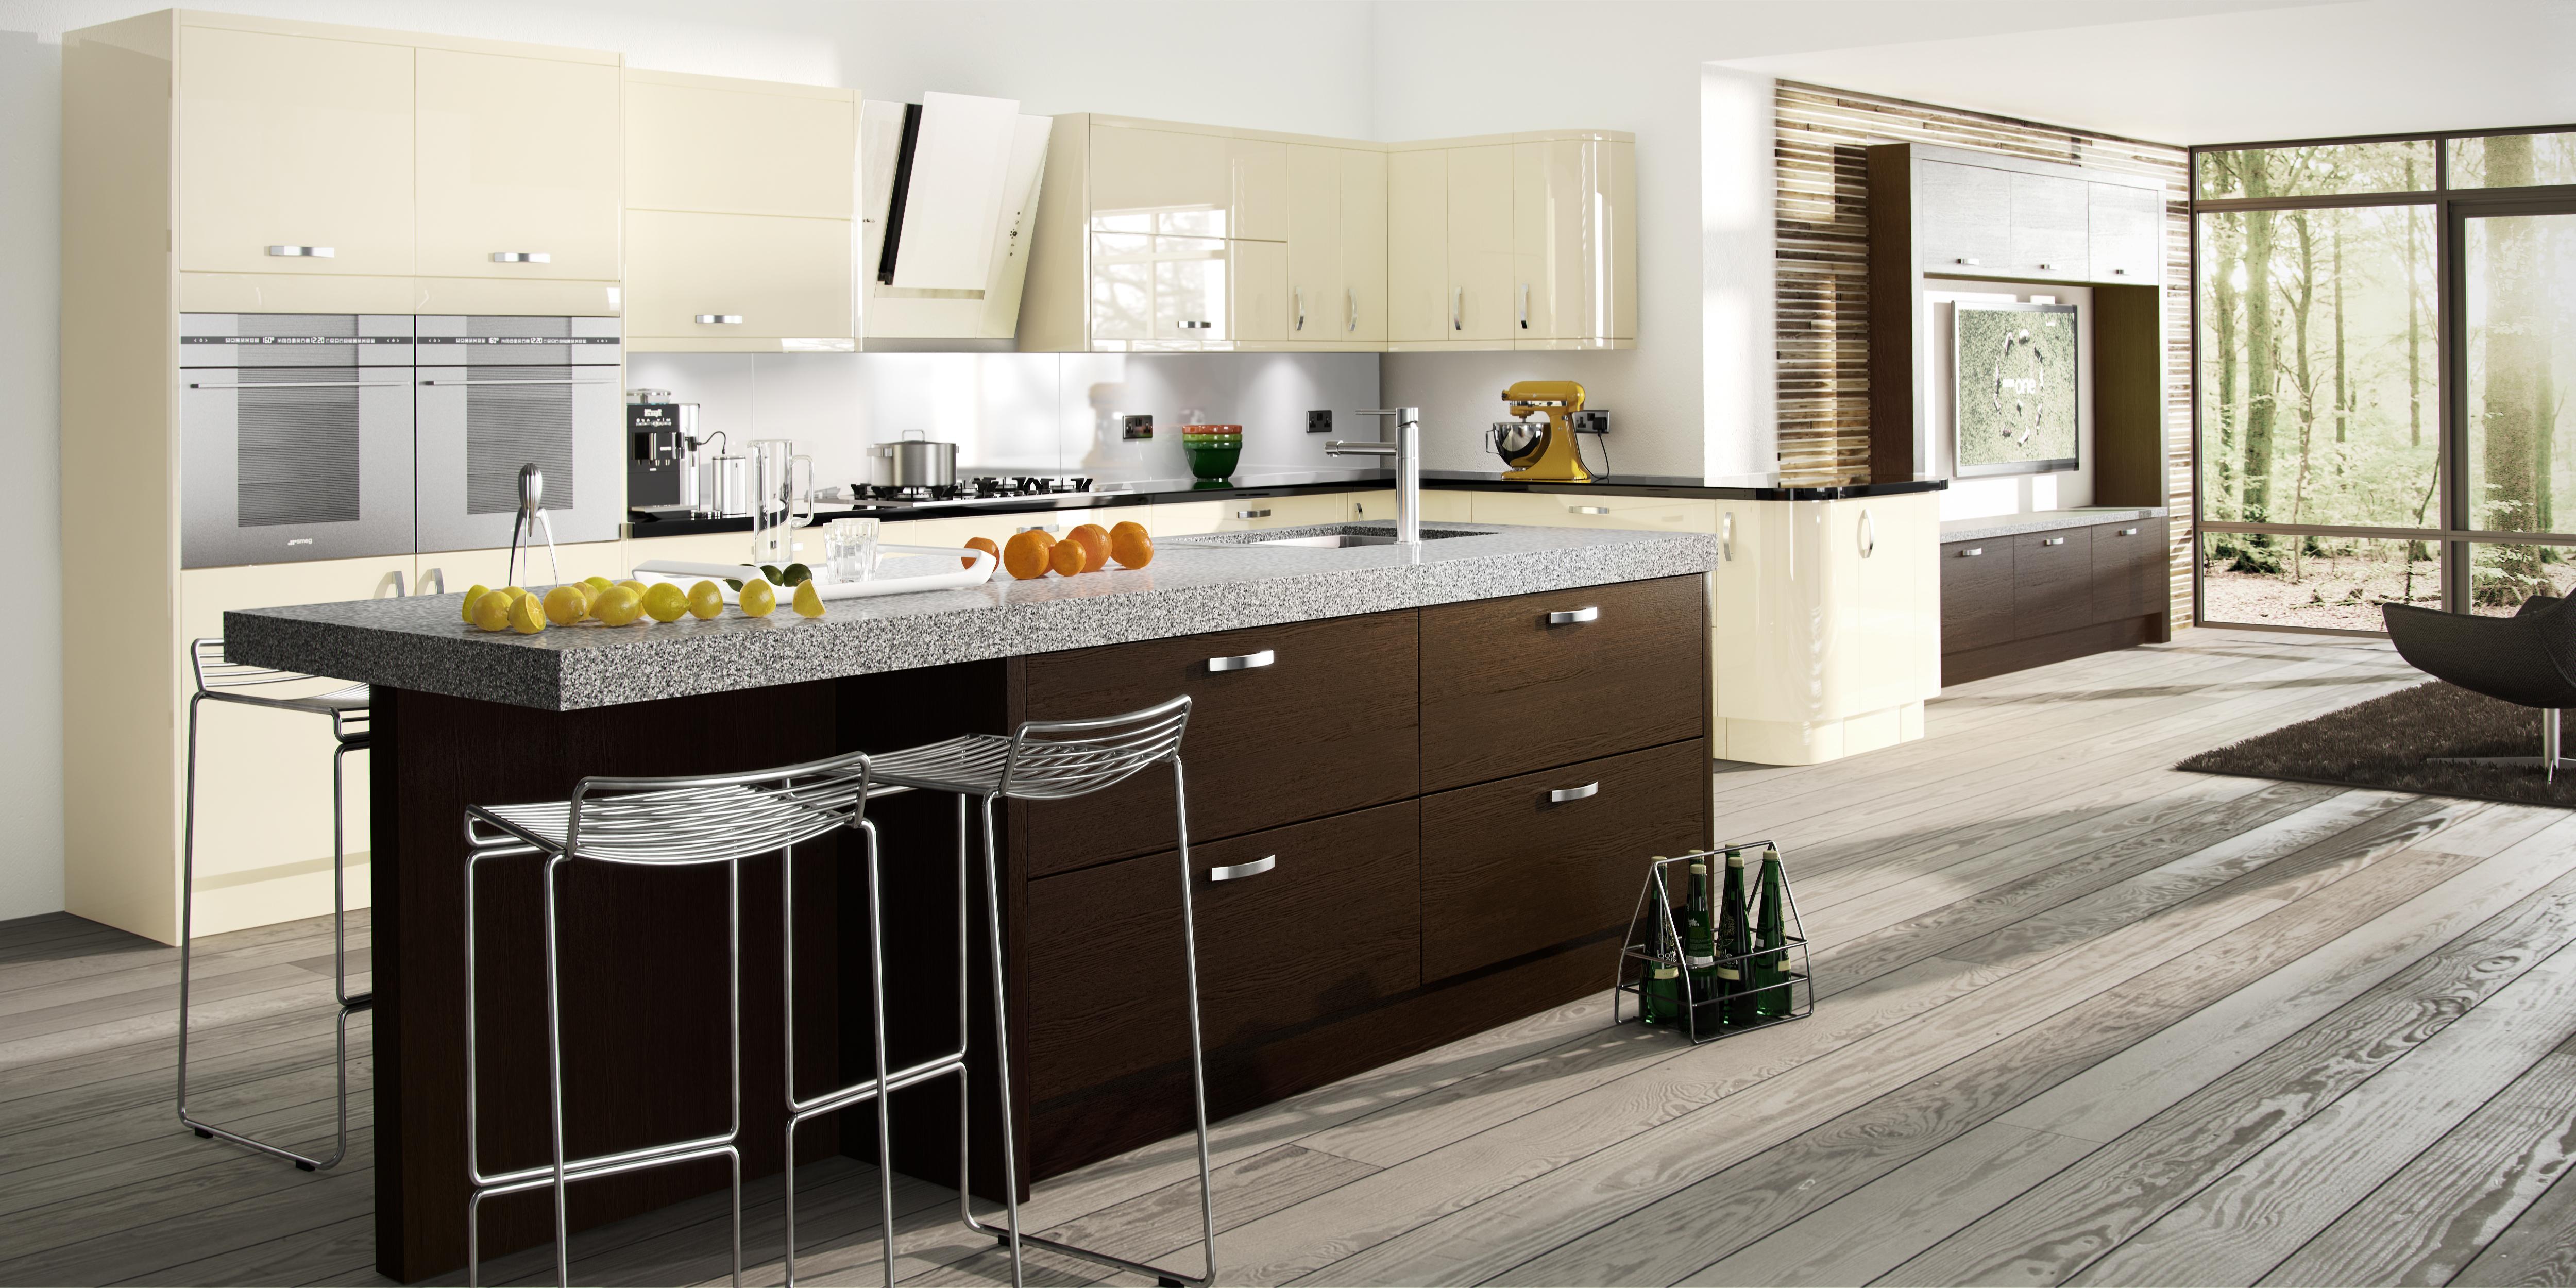 new kitchen designs. Astro Vanilla With Tavola Oak Black Brown Ferrara New Kitchen Designs S